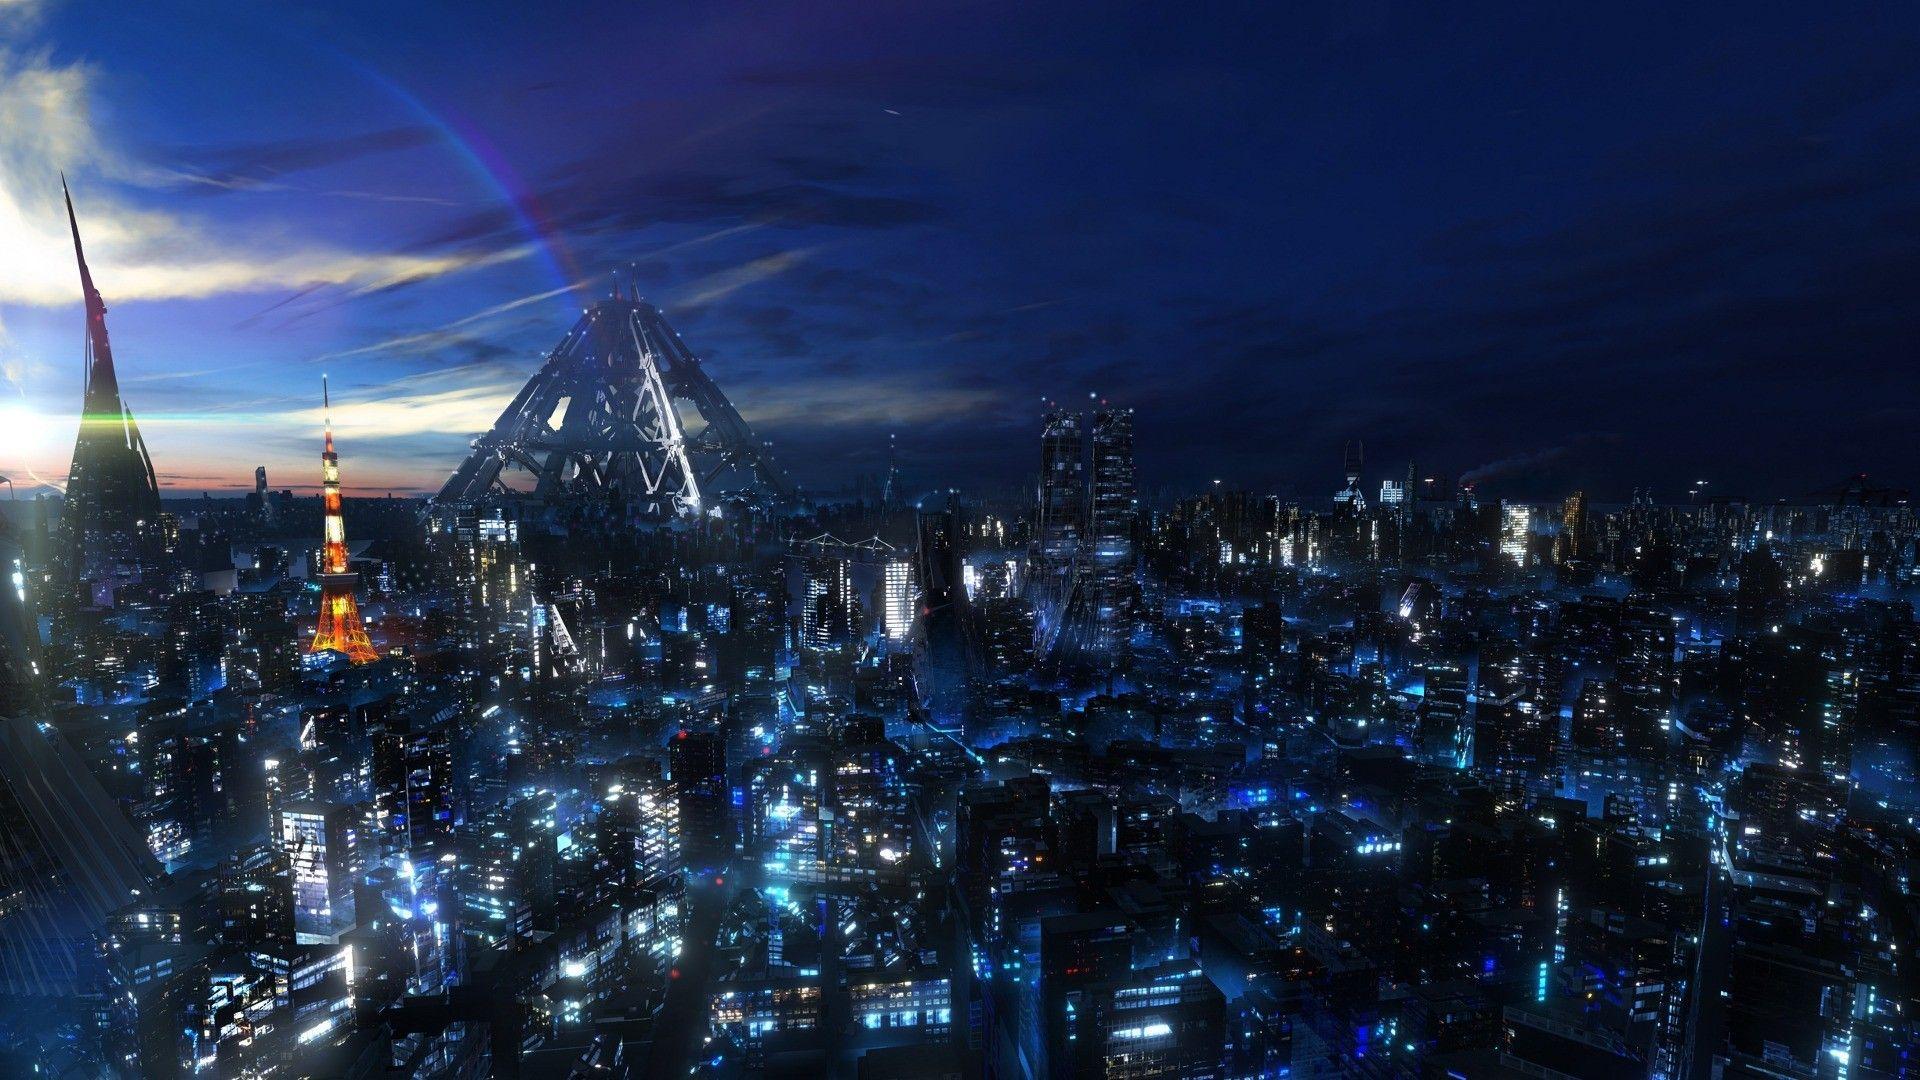 Pin By Timoteo Velosa On Fantastic Cities Anime City Futuristic City Anime Scenery